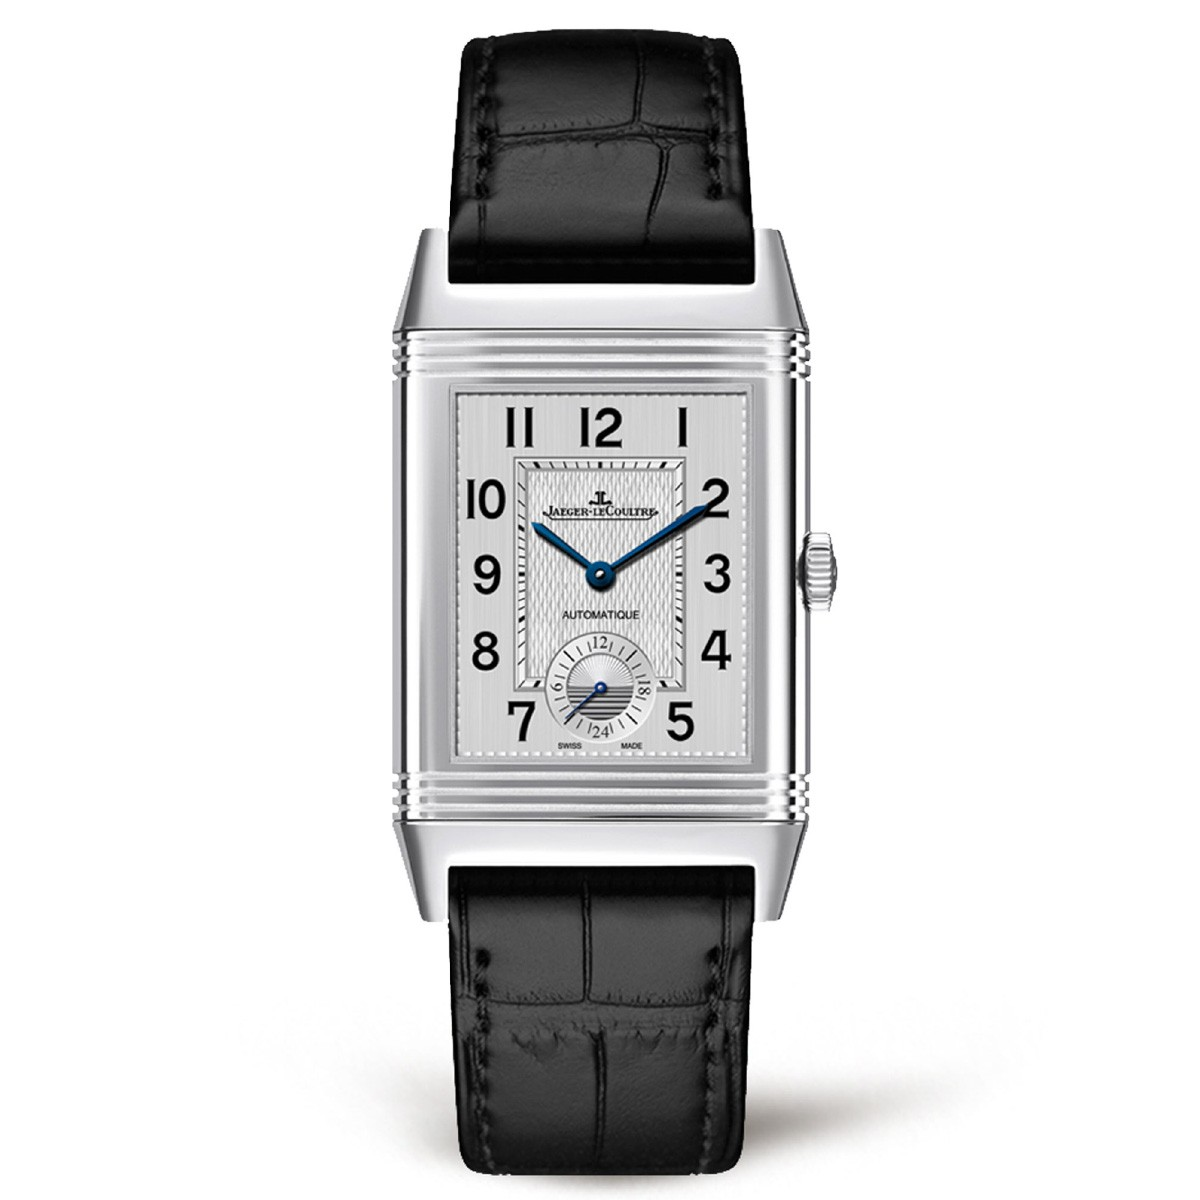 Produkt-5-JLC-Reverso-Classic-Large-Duoface-ref-3838420-Preis-11